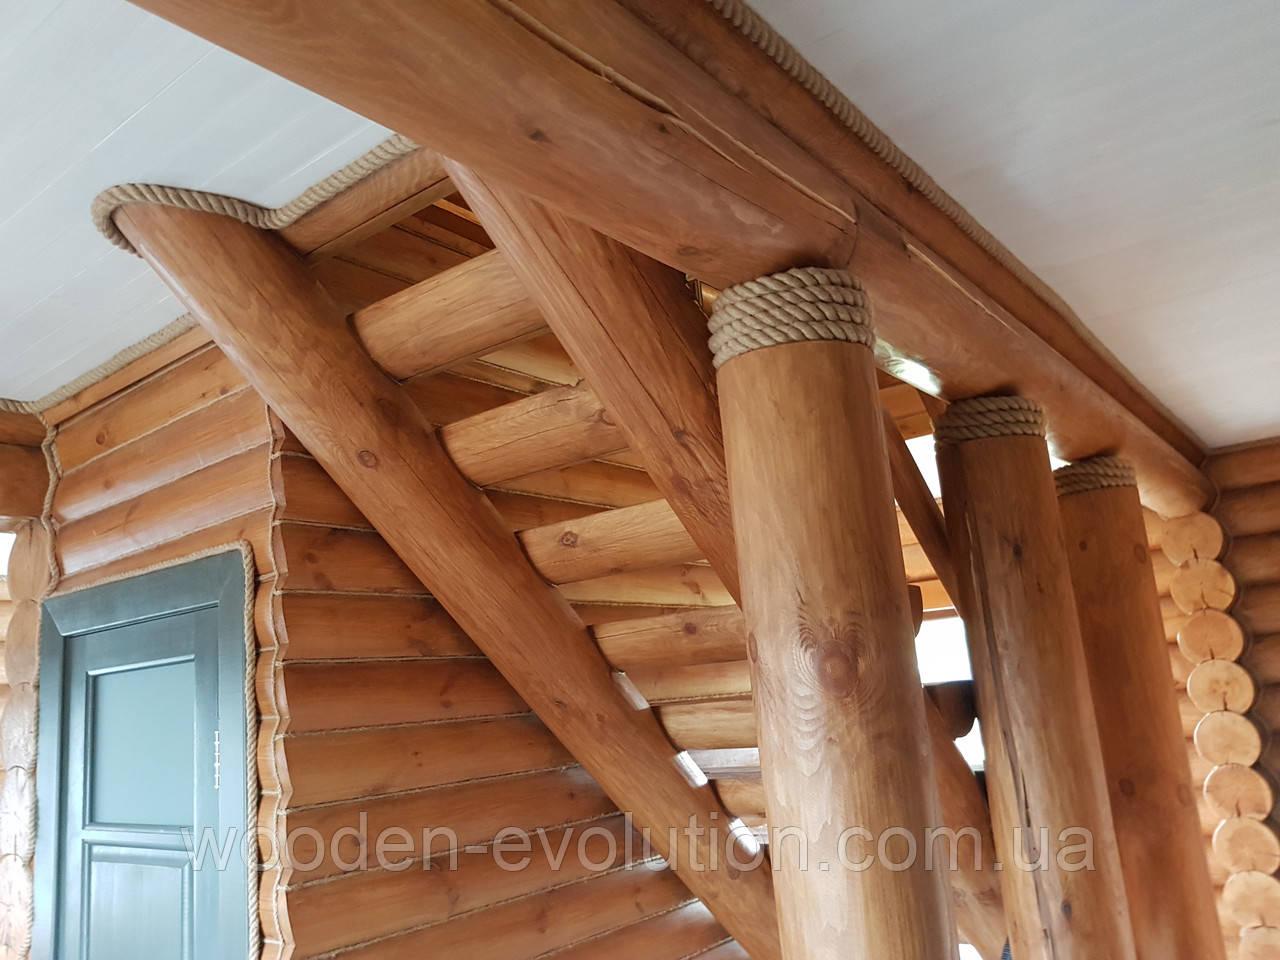 Декорирование канатом, монтаж каната